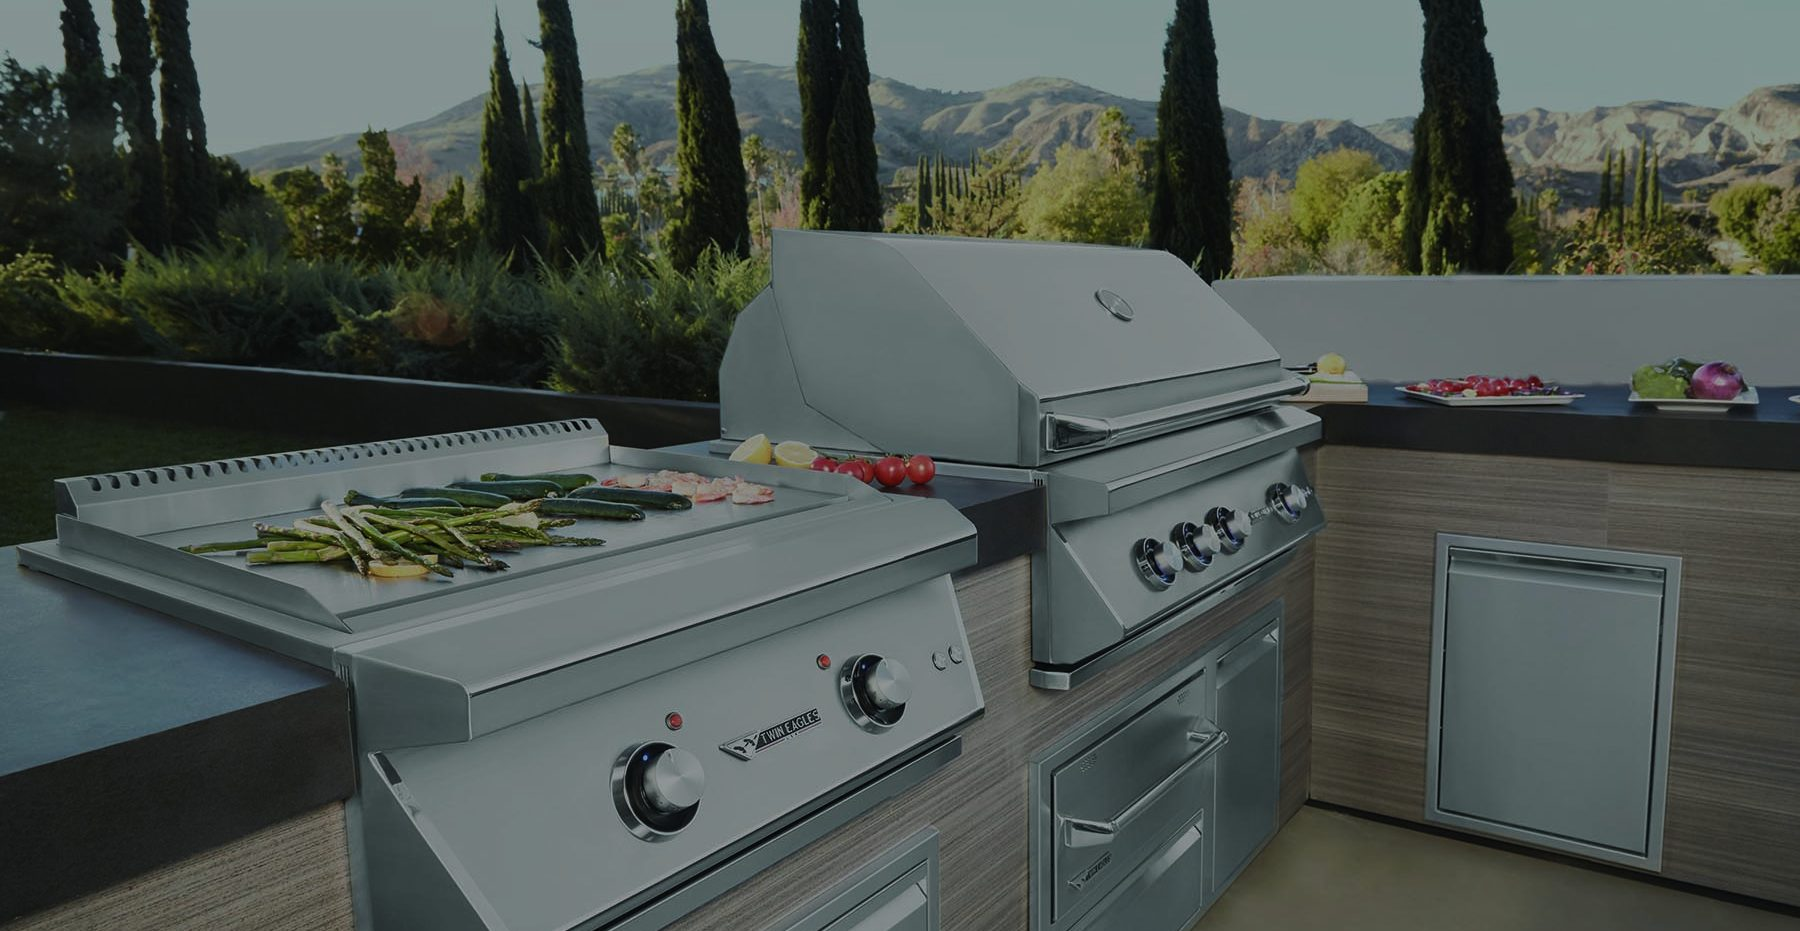 twin eagles grills copy e1601236671443